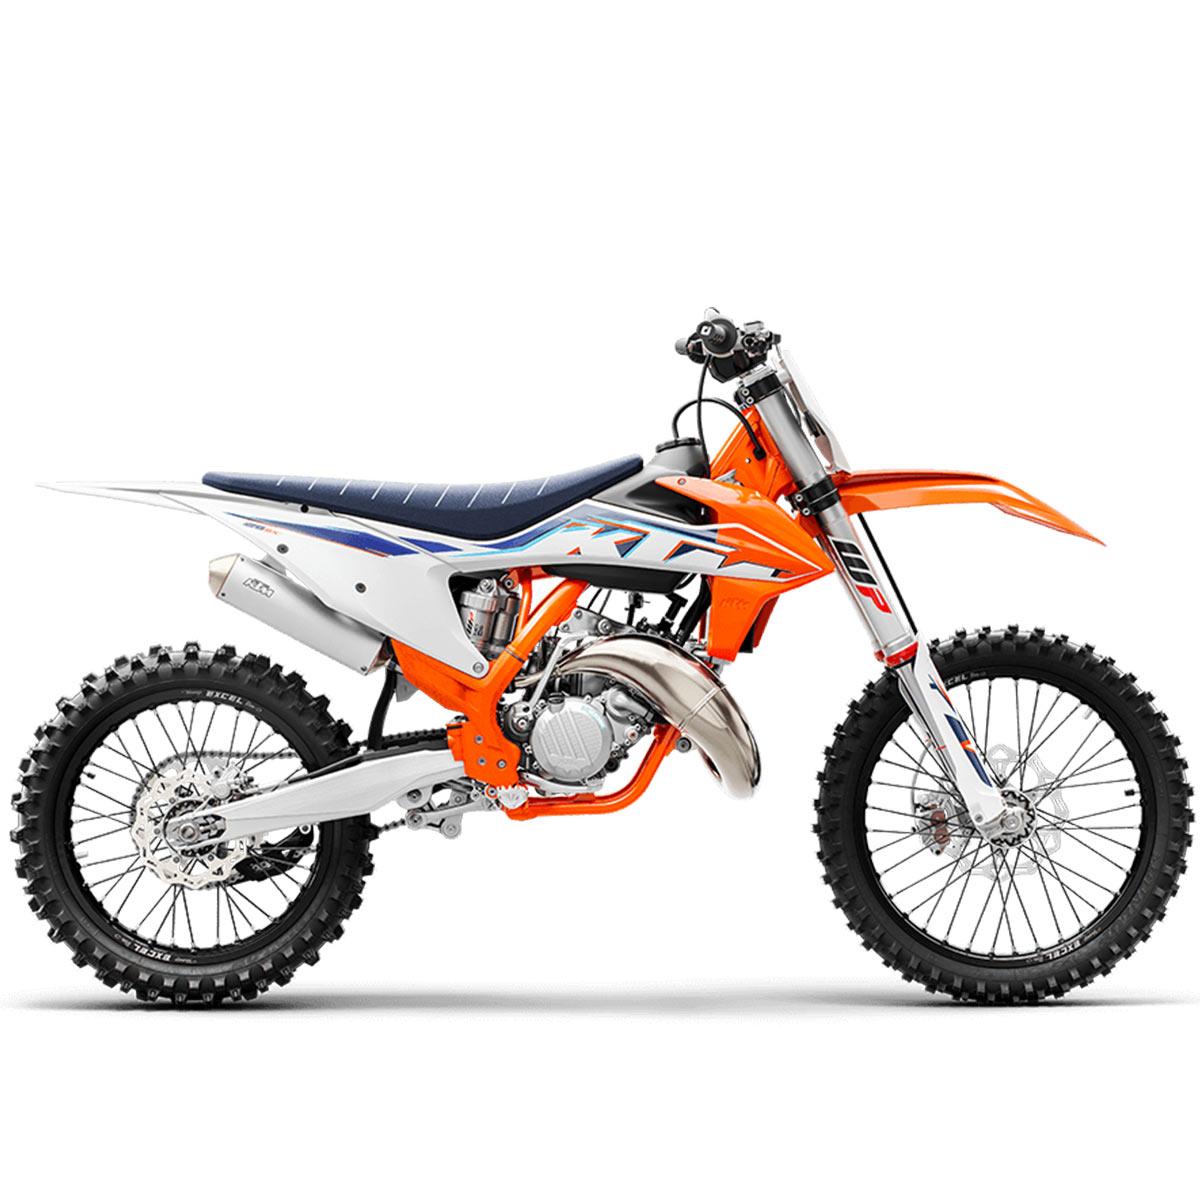 KTM-125-SX